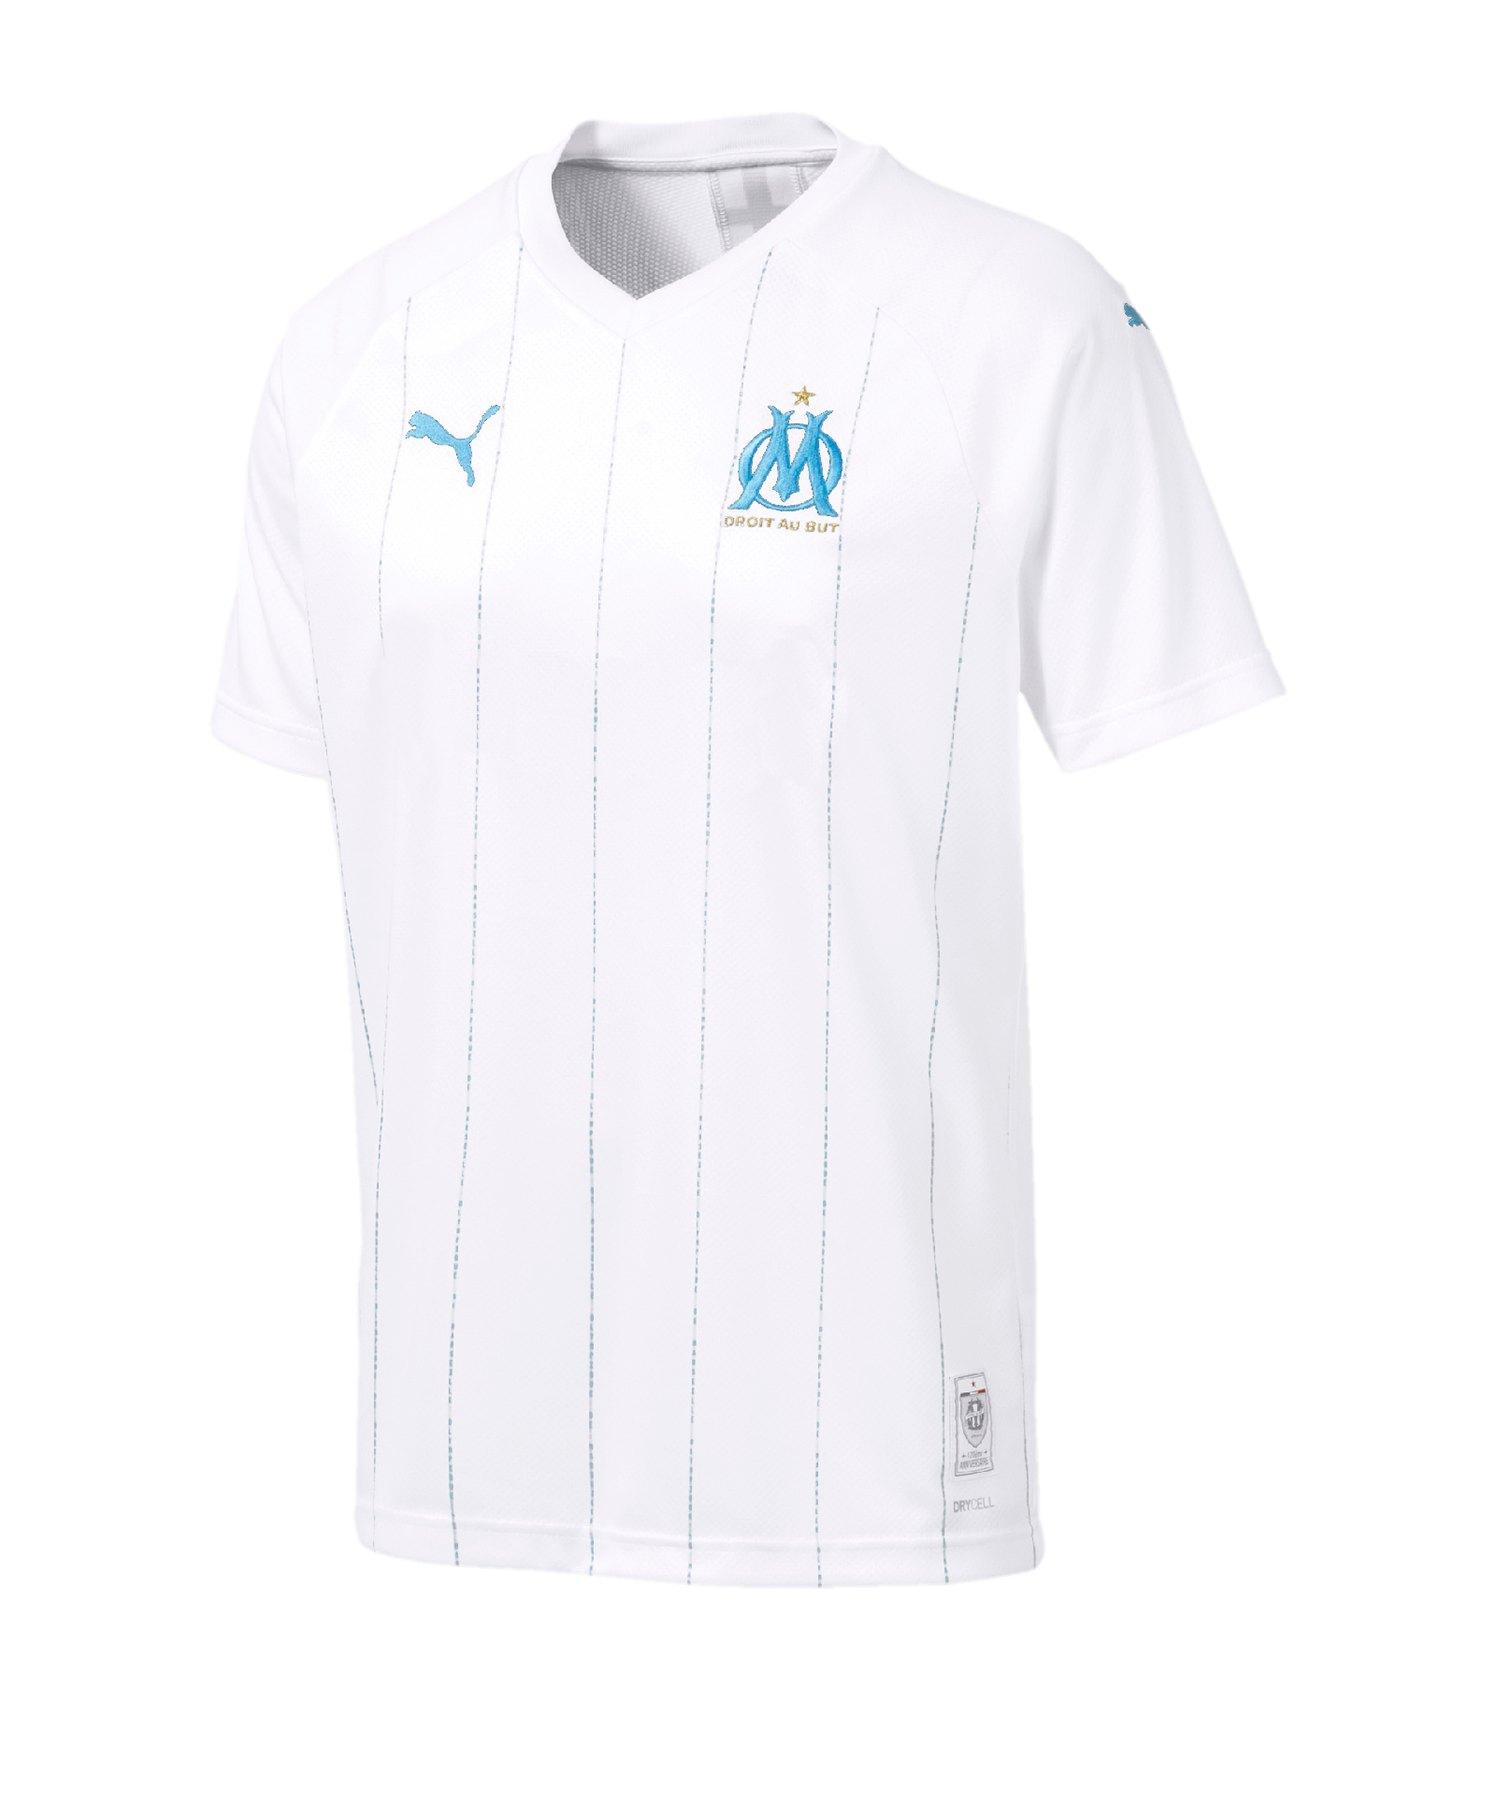 PUMA Olympique Marseille Trikot Home 2019/2020 F01 - Weiss